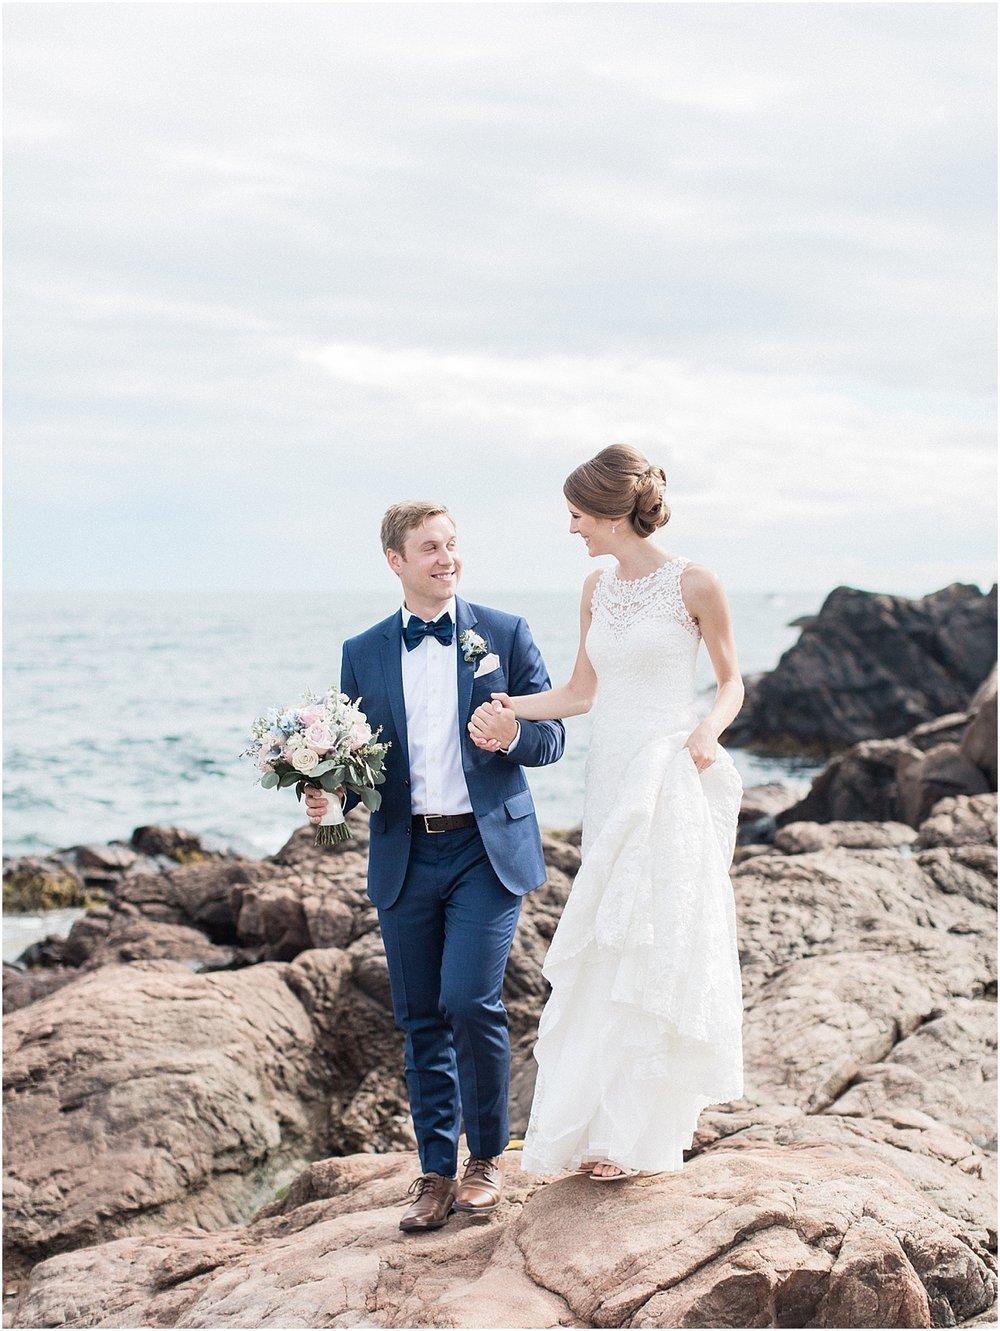 kelly_zach_cruisport_gloucester_ma_bass_rocks_cape_cod_boston_wedding_photographer_meredith_jane_photography_photo_0678.jpg